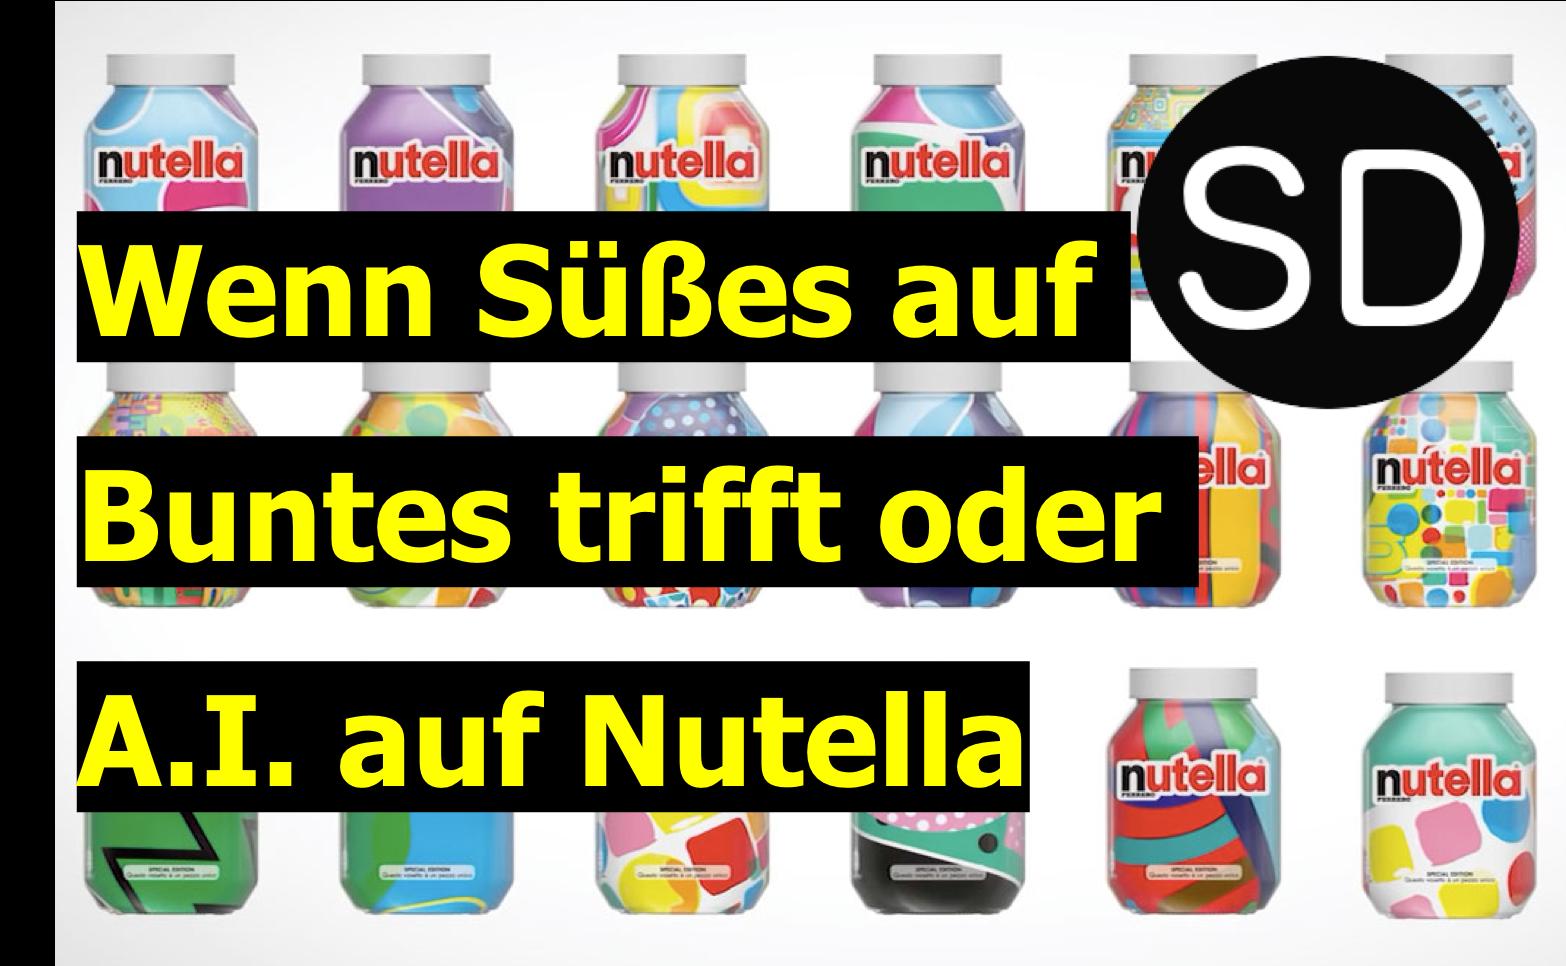 How To – Nutella und A.I. – Wenn Süßes auf Buntes trifft